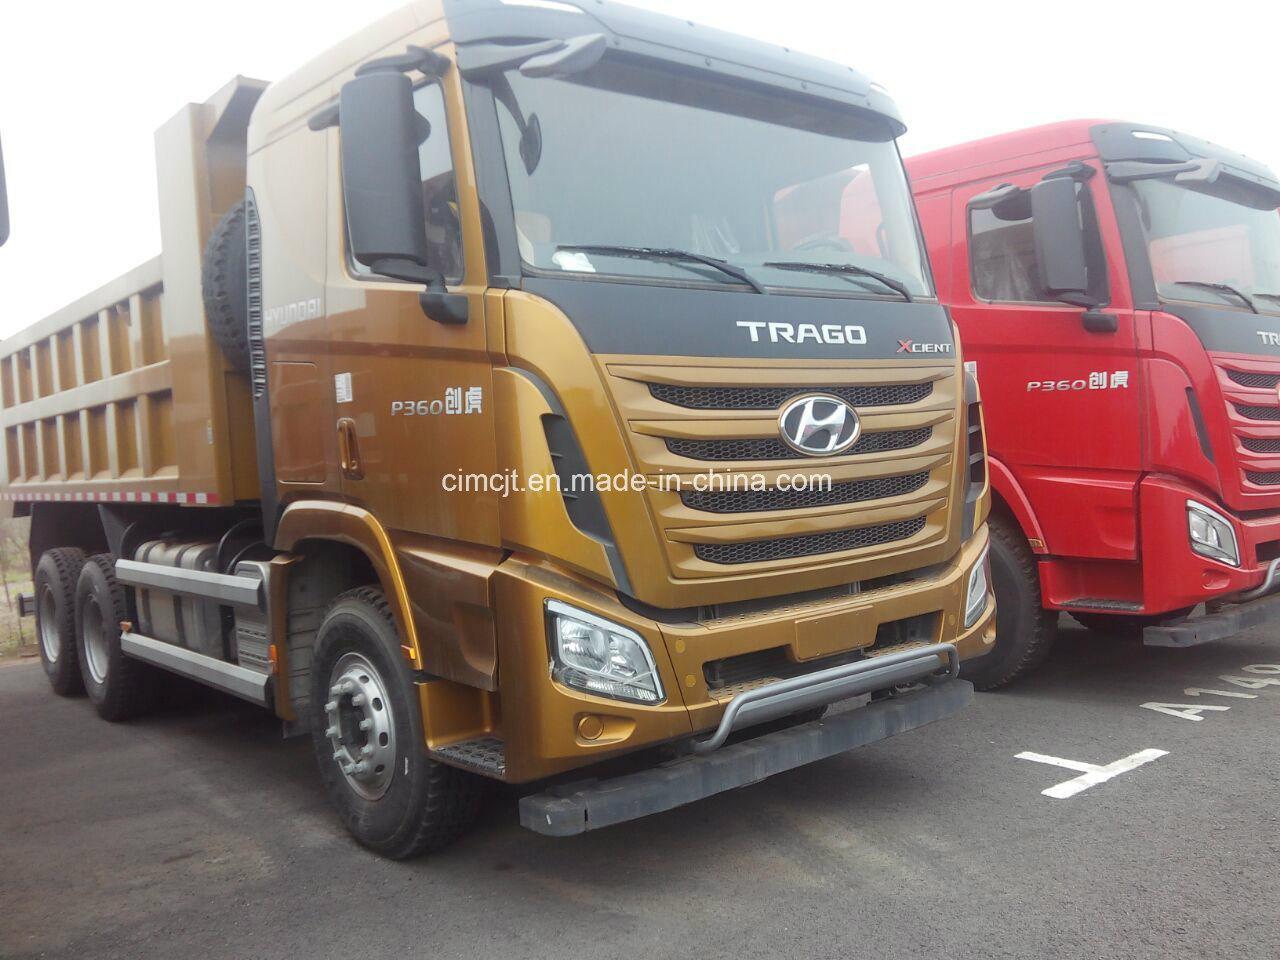 China New Hyundai Xcient 6x4 Heavy Truck With Best Price